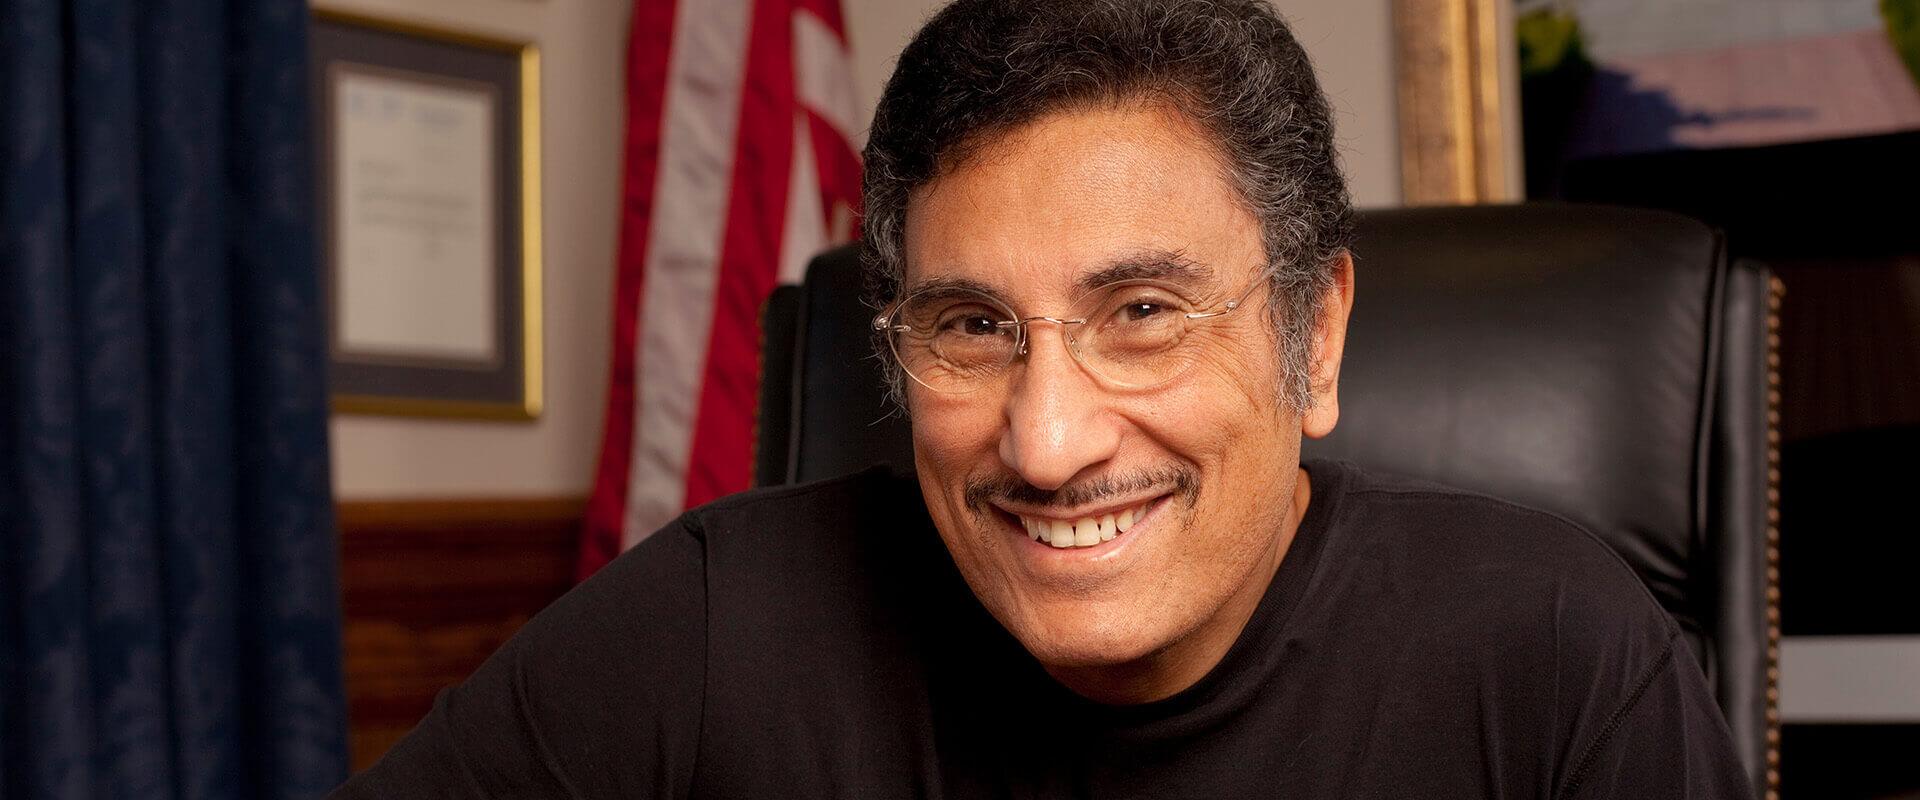 Dr. Michael Youssef